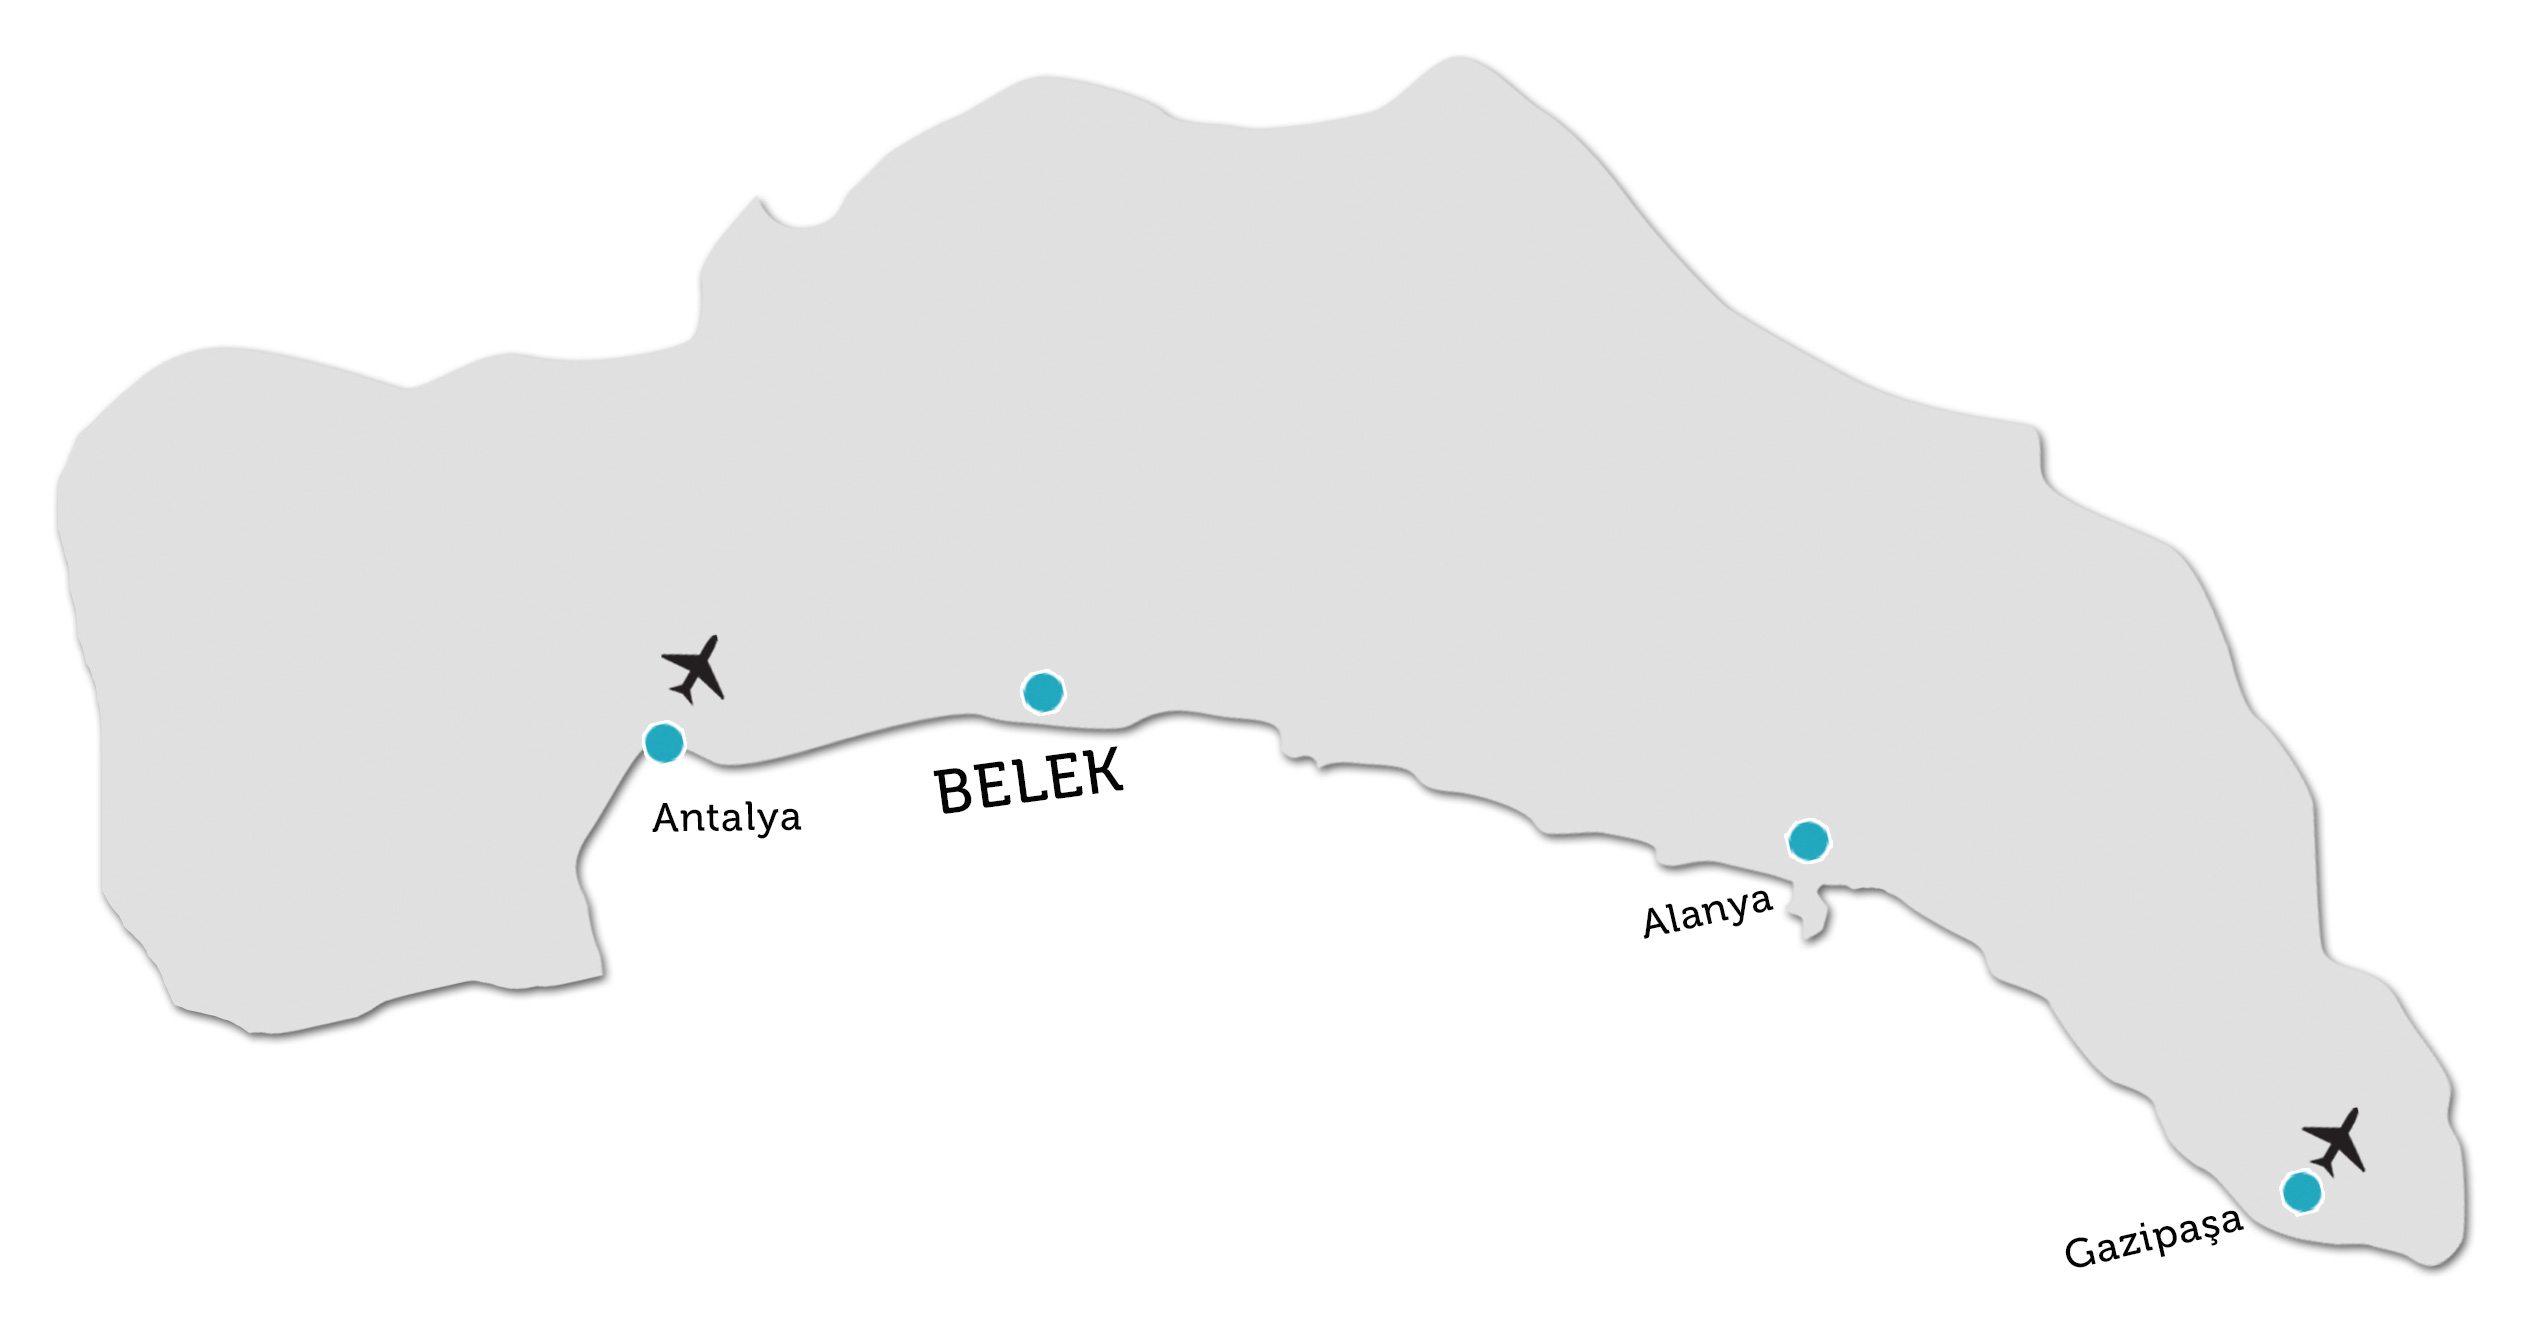 Belek Property Locations On Map